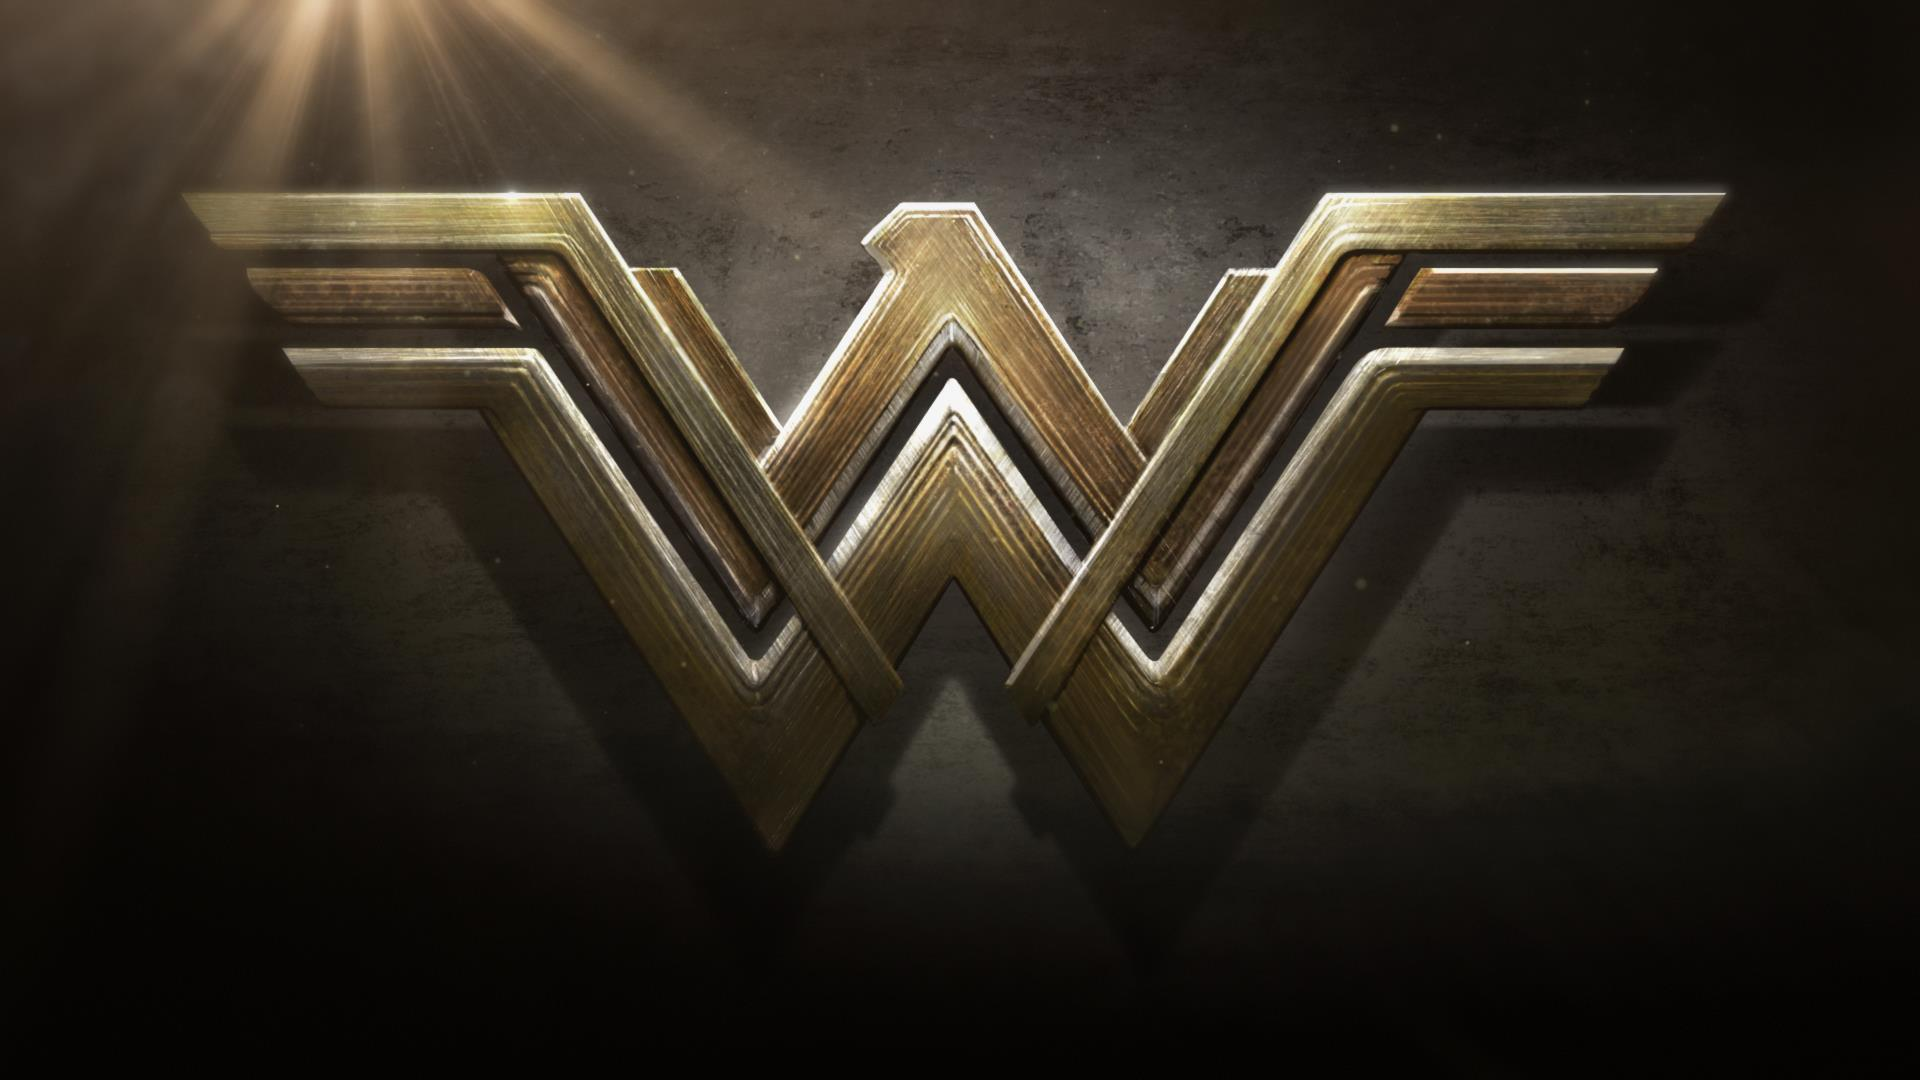 Wonder Woman Logo Wallpaper 61 Images: Superman Logo Wallpapers 2017